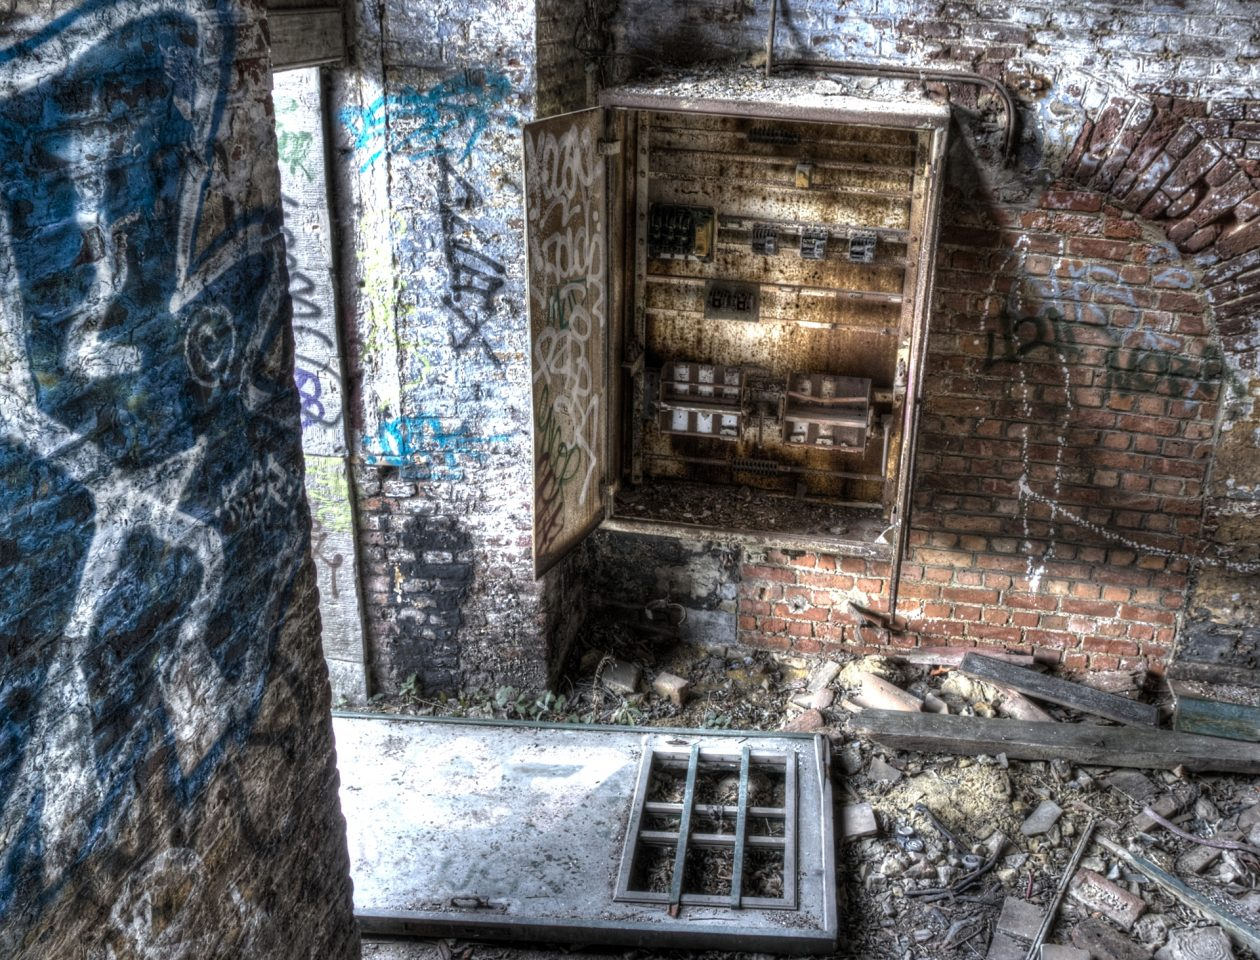 urban decay - Kaserne in Belgien